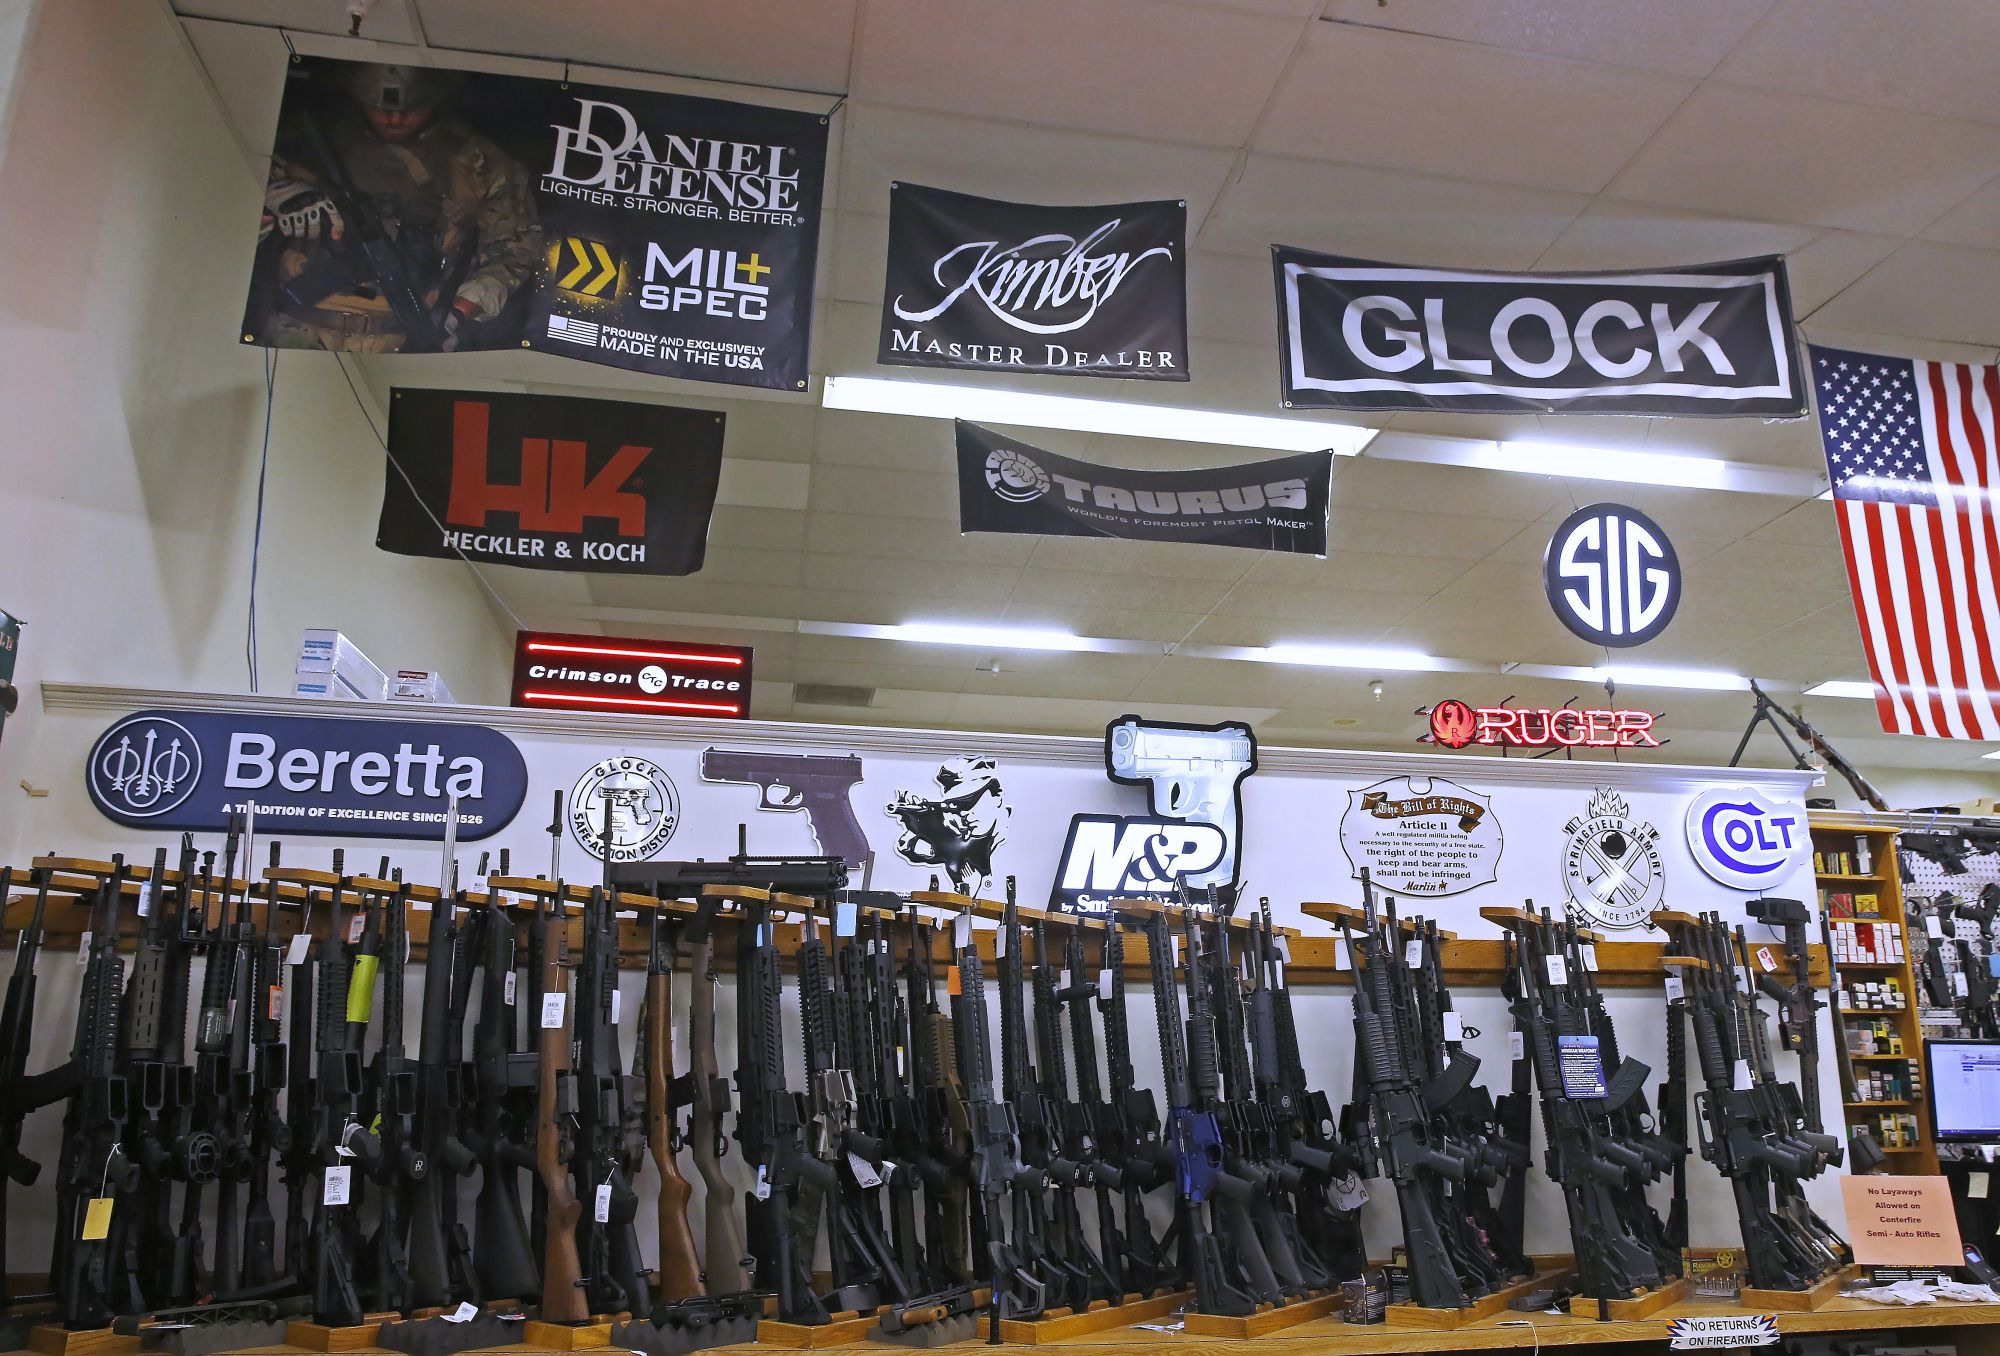 2020 Democrats Warm to Mandatory 'Buybacks' of Assault Weapons